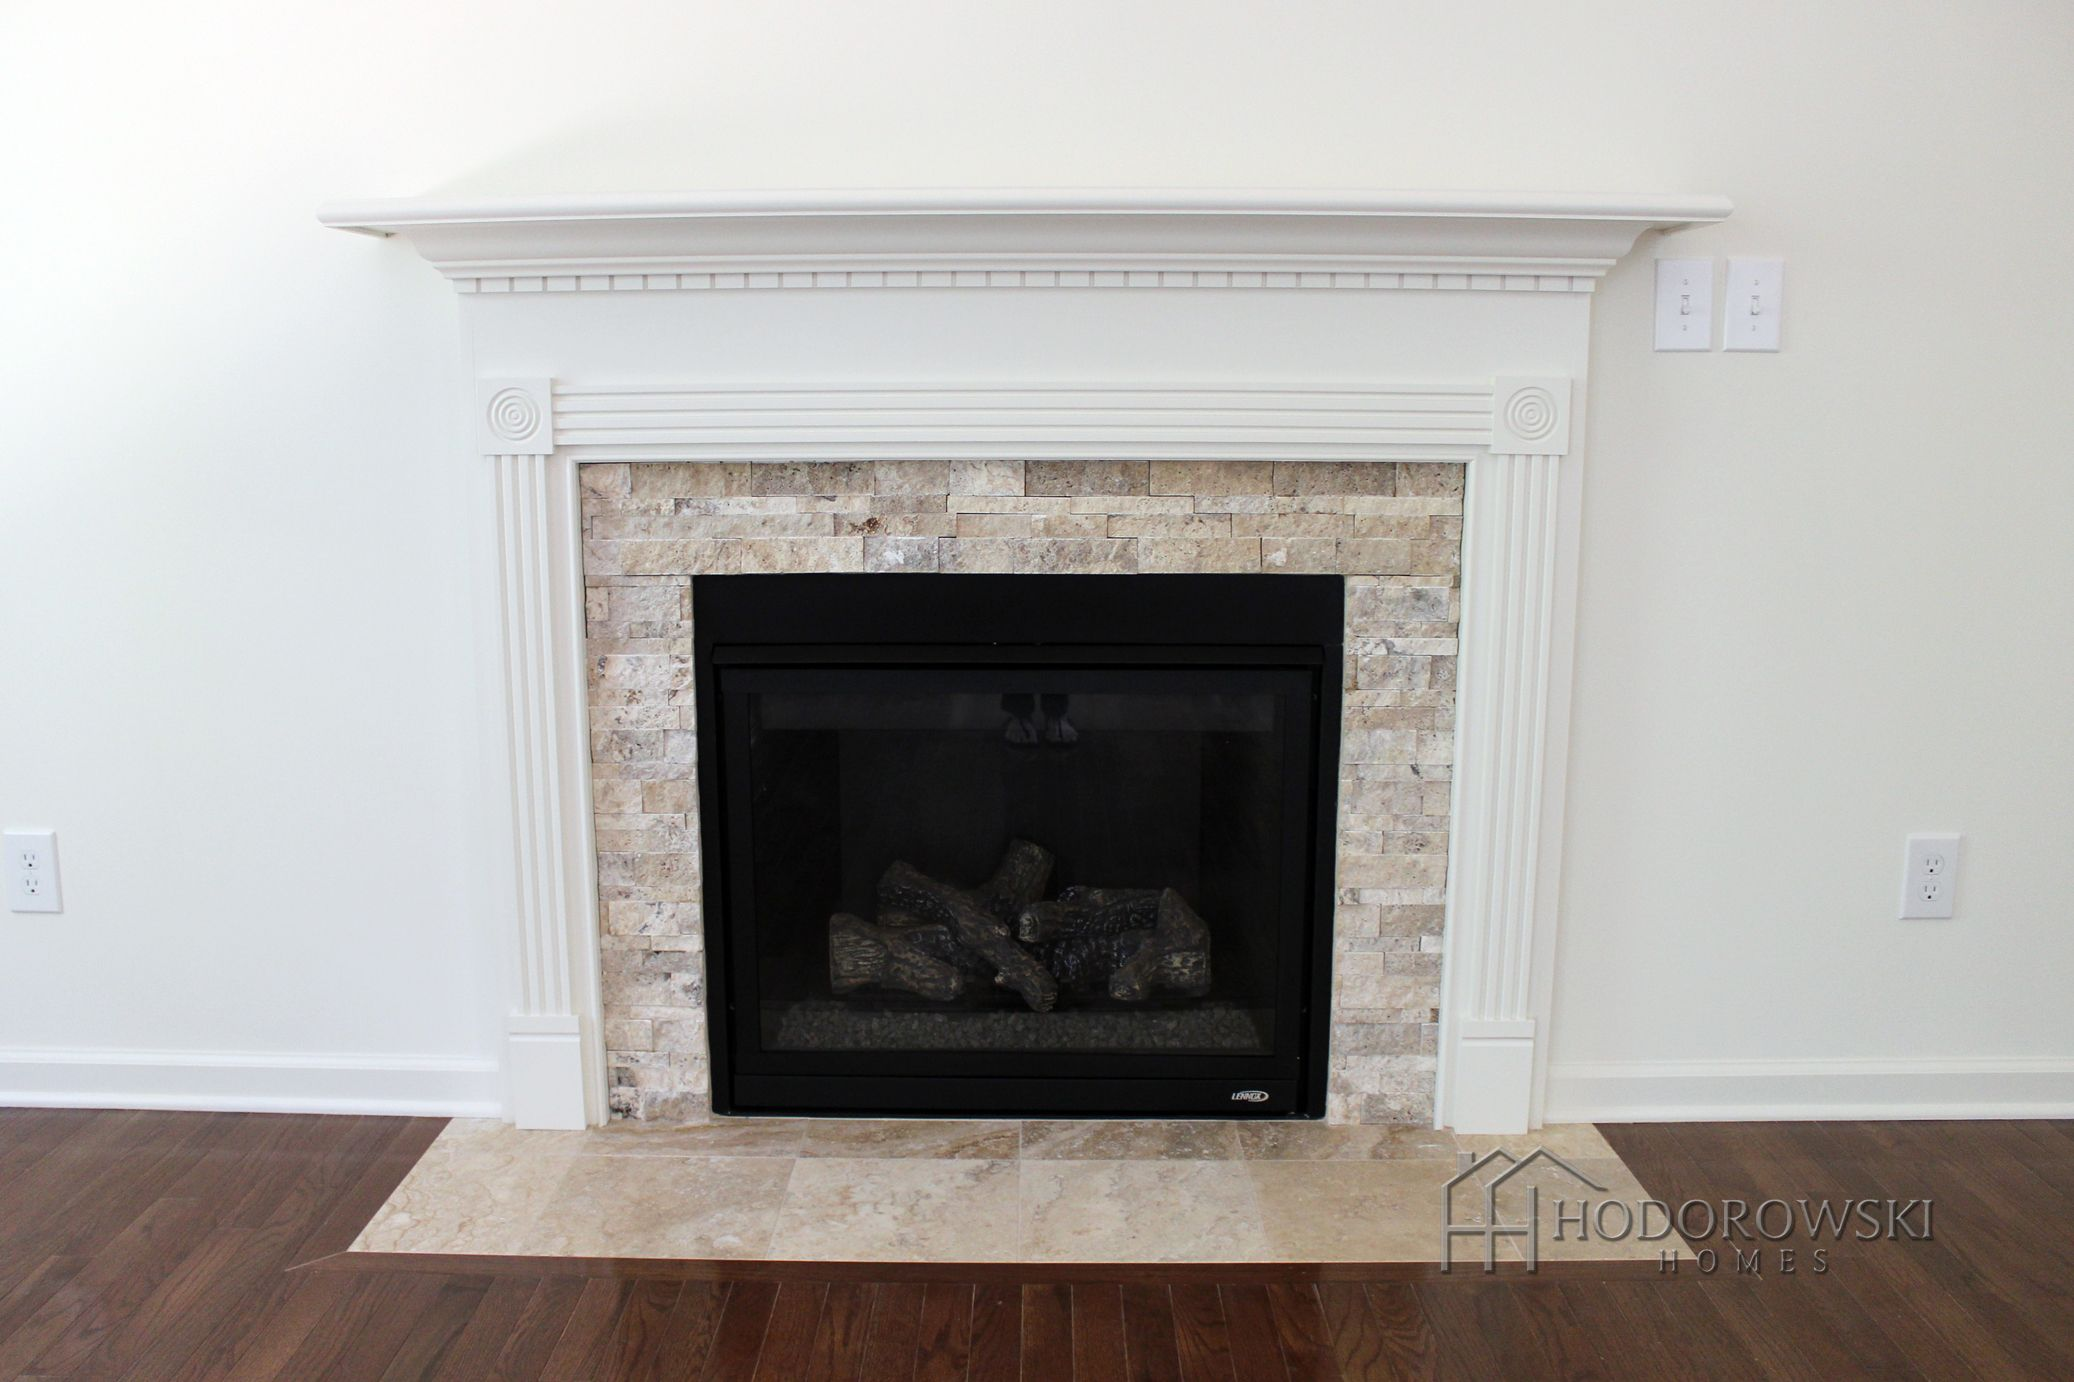 philadelphia ledgestone fireplace face with 12x12 philadelphia